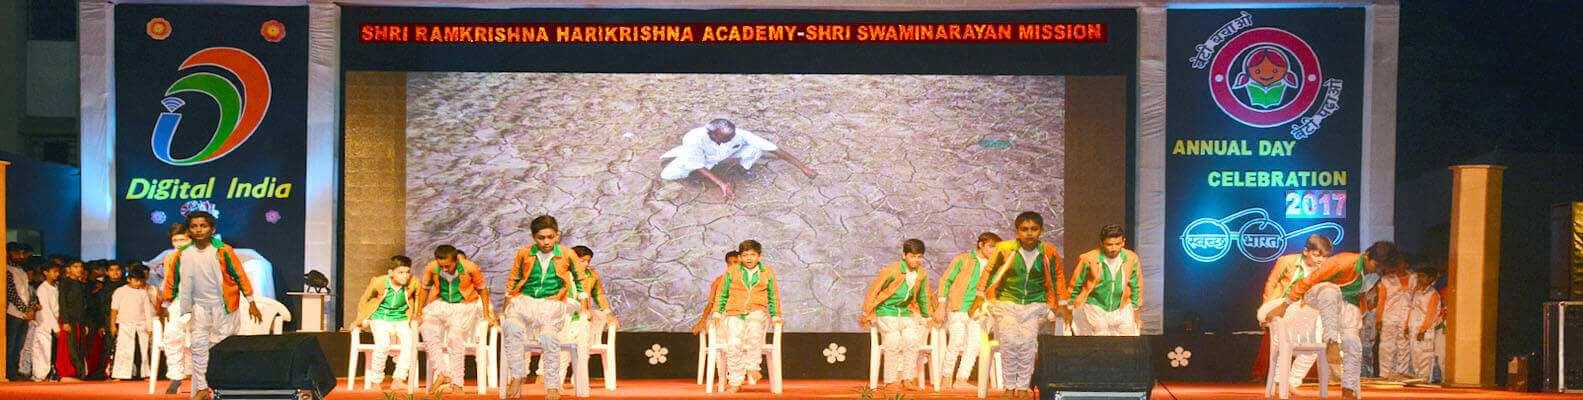 shriswaminarayanmission slider